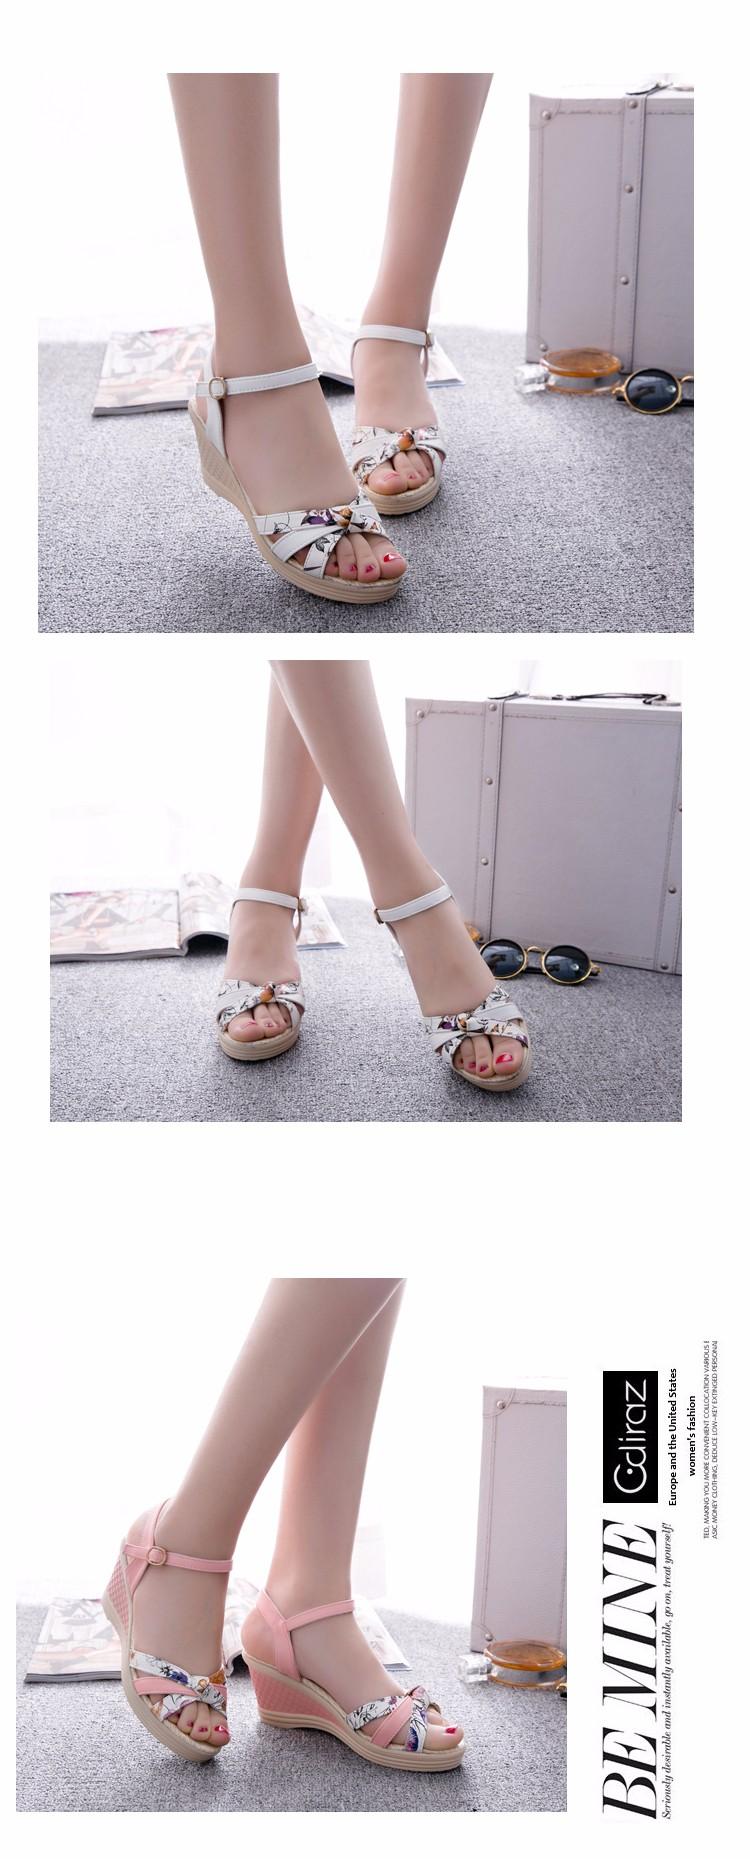 f47bc28ac8599 2016 Cute Women Sandals Newest Cork Appliques Women Flat Platform Sandals  Rome Buckle Fretwork Wedges Sandals G97 35